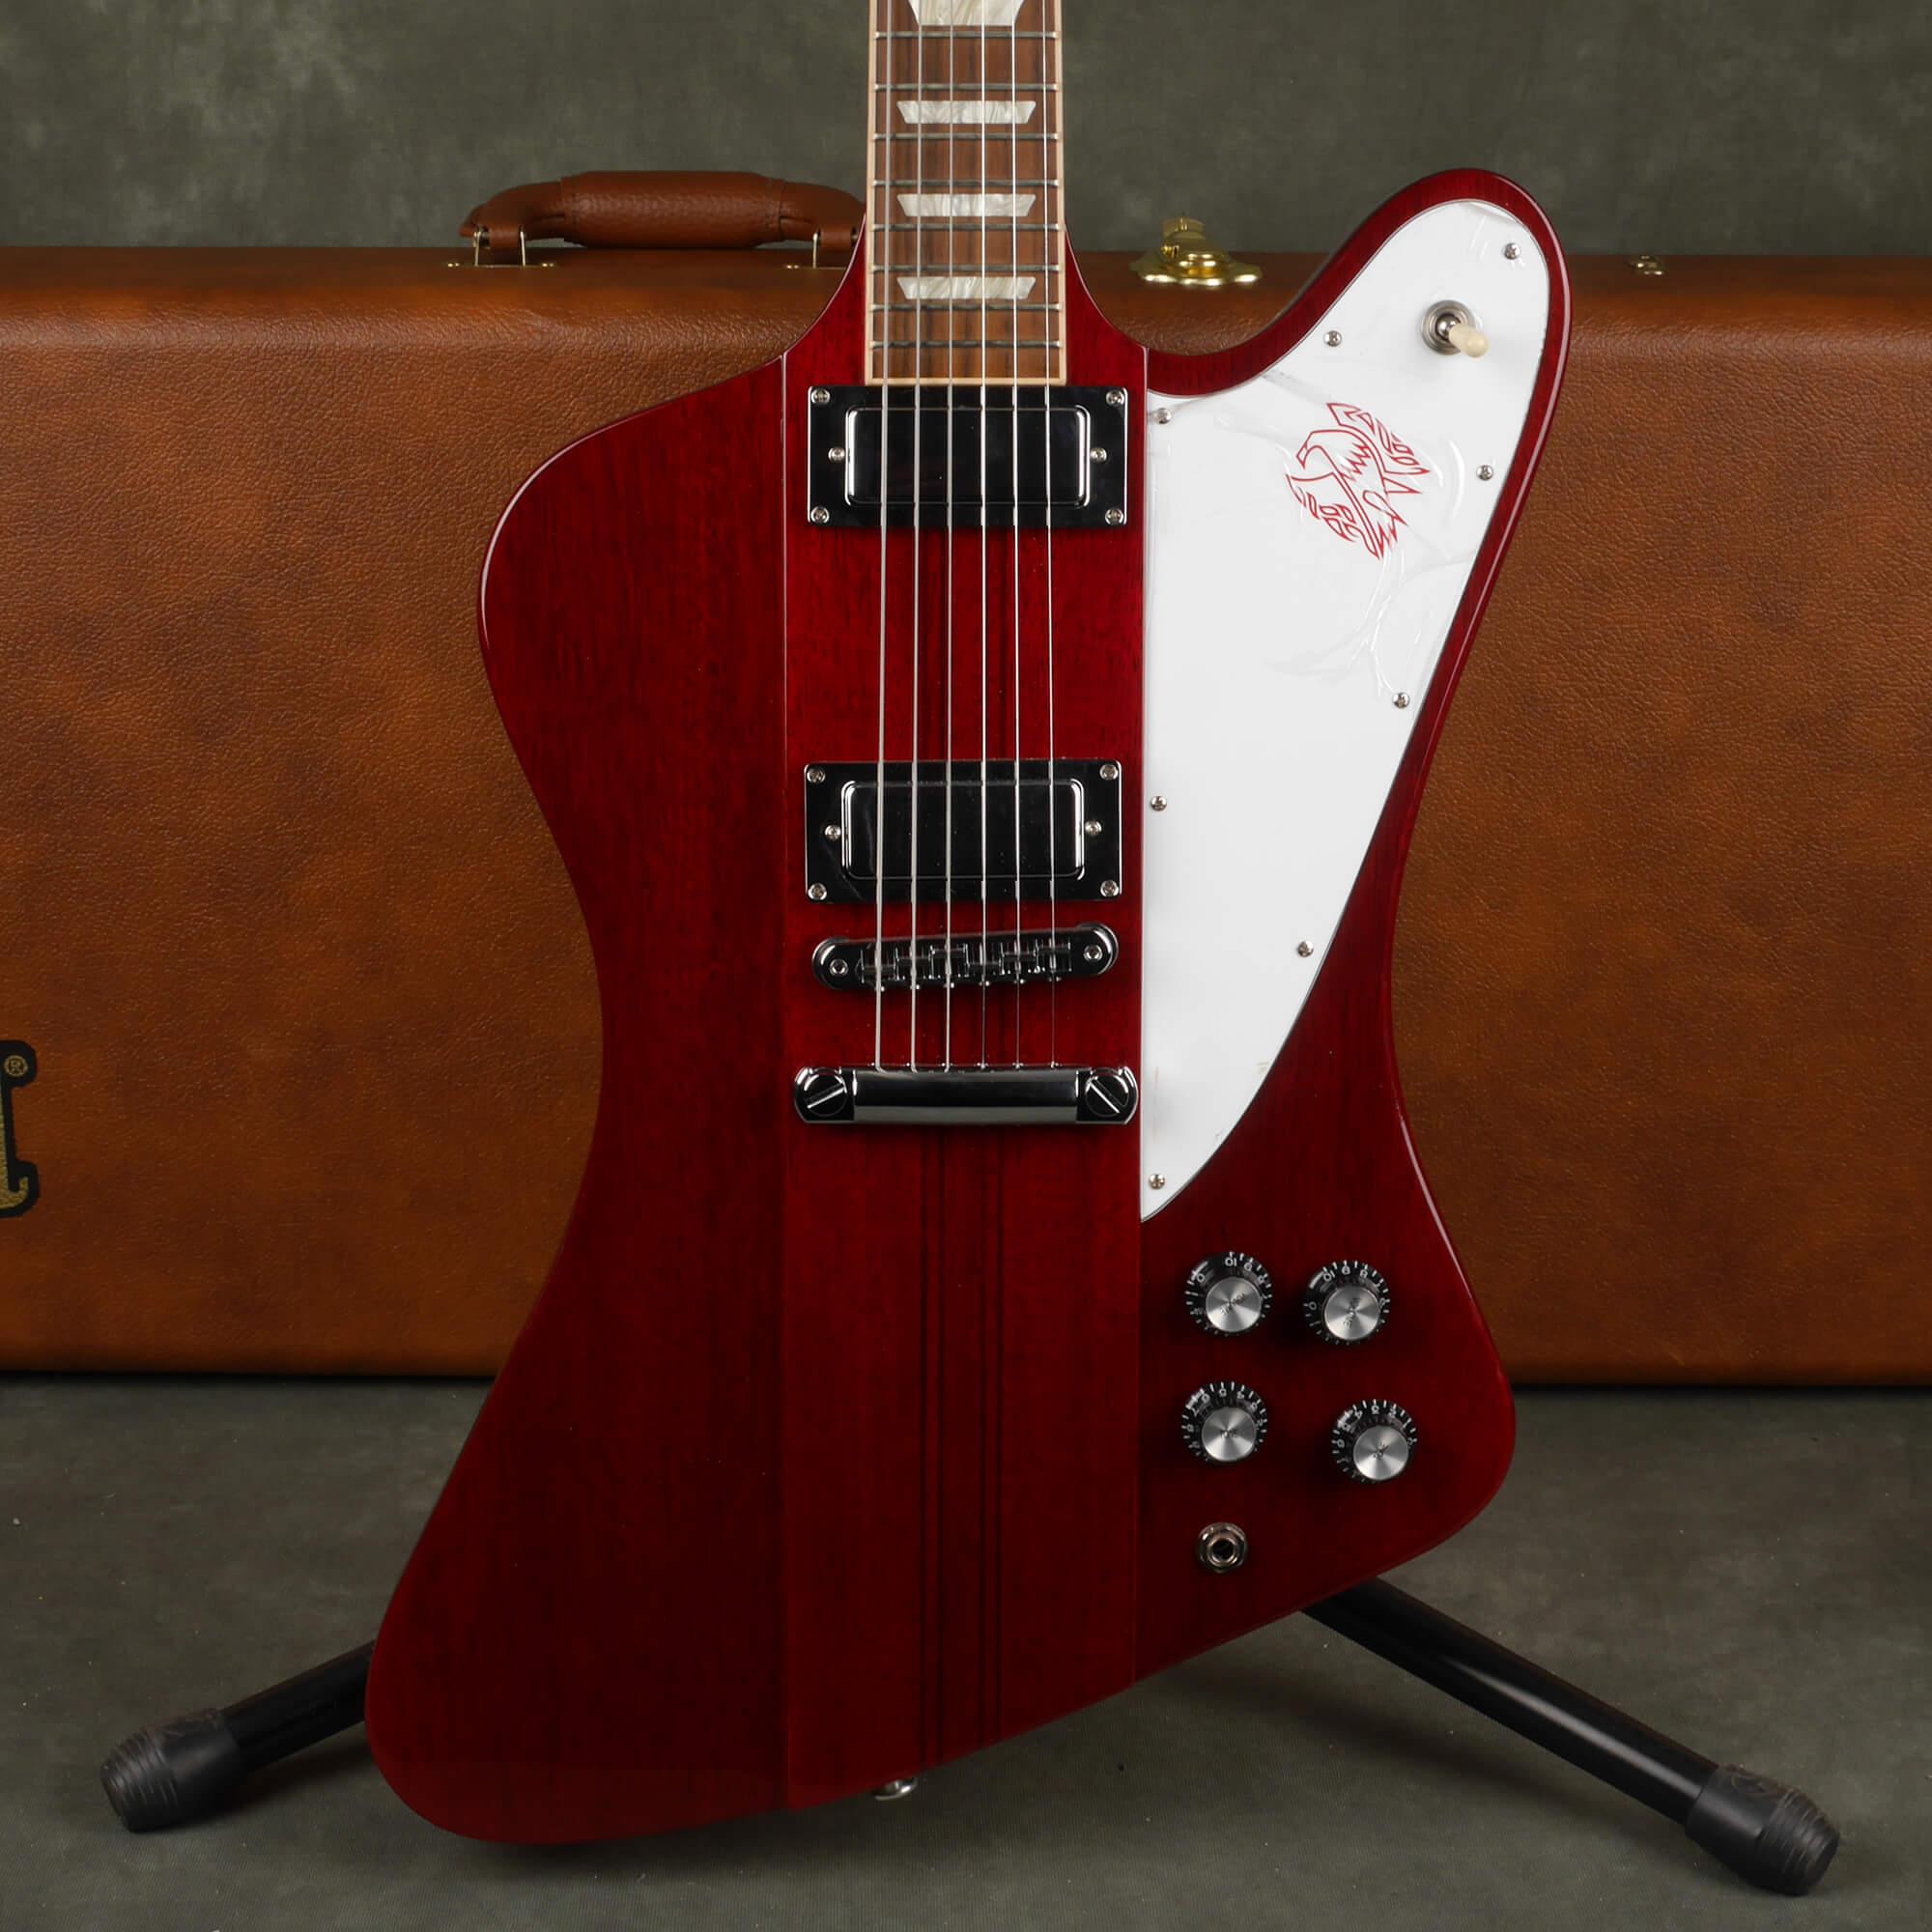 Gibson Firebird Electric Guitar - Cherry Red w/Hard Case - 2nd Hand